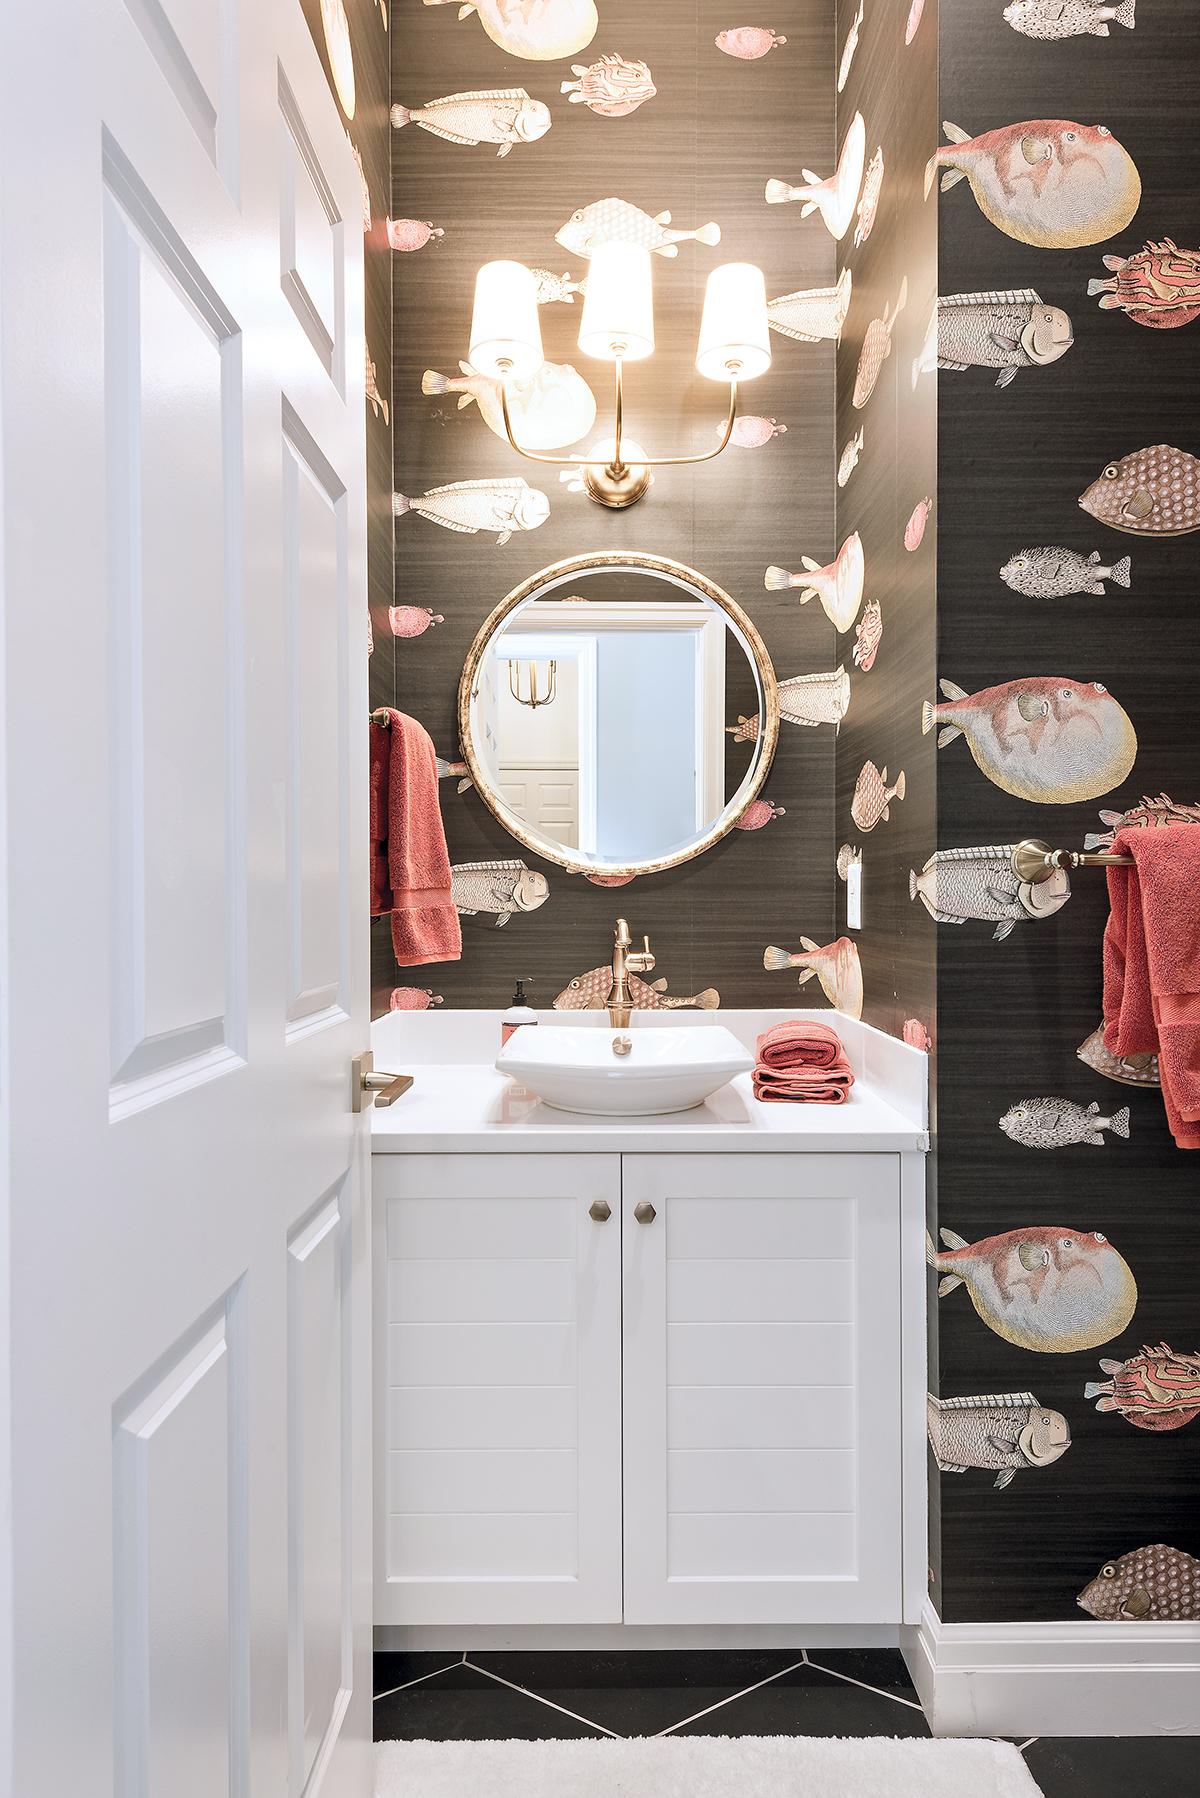 Collins & Dupont Design Group powder room pizzazz | kitchen & bath design news